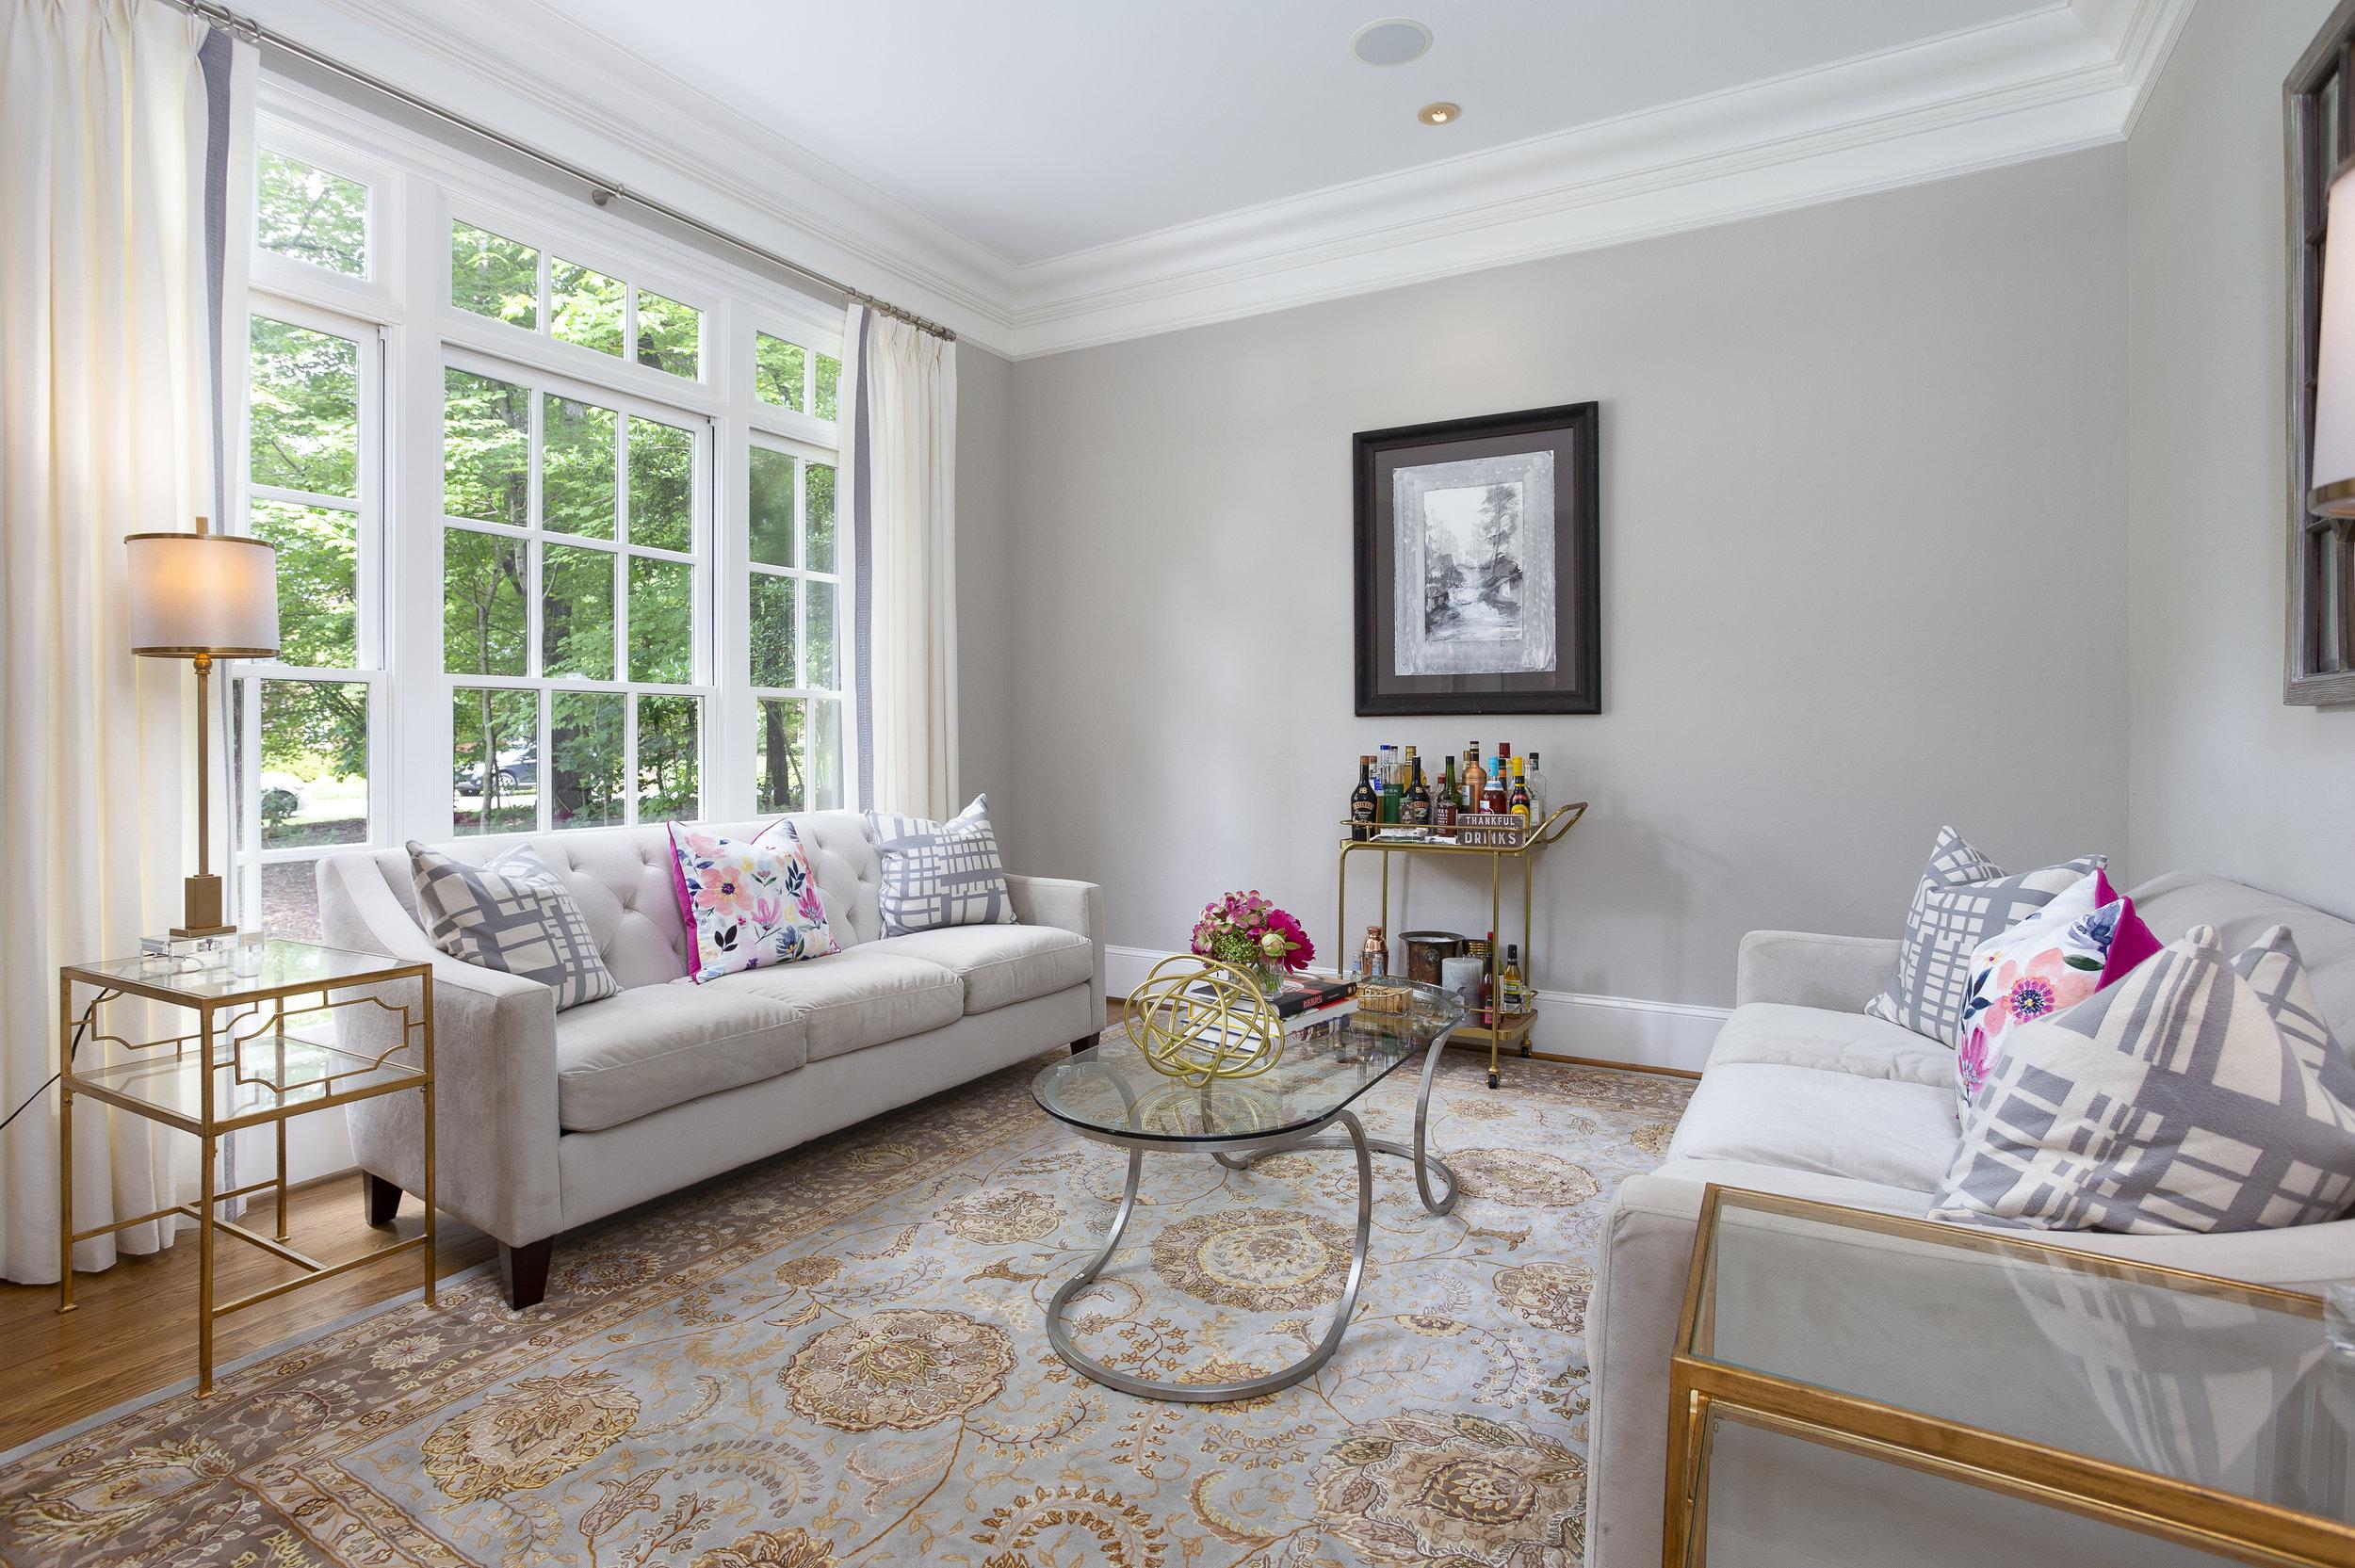 greesboro-real-estate-photographer-photography-commercial-realtor-house-high-point-kernersville-burlington100.jpg